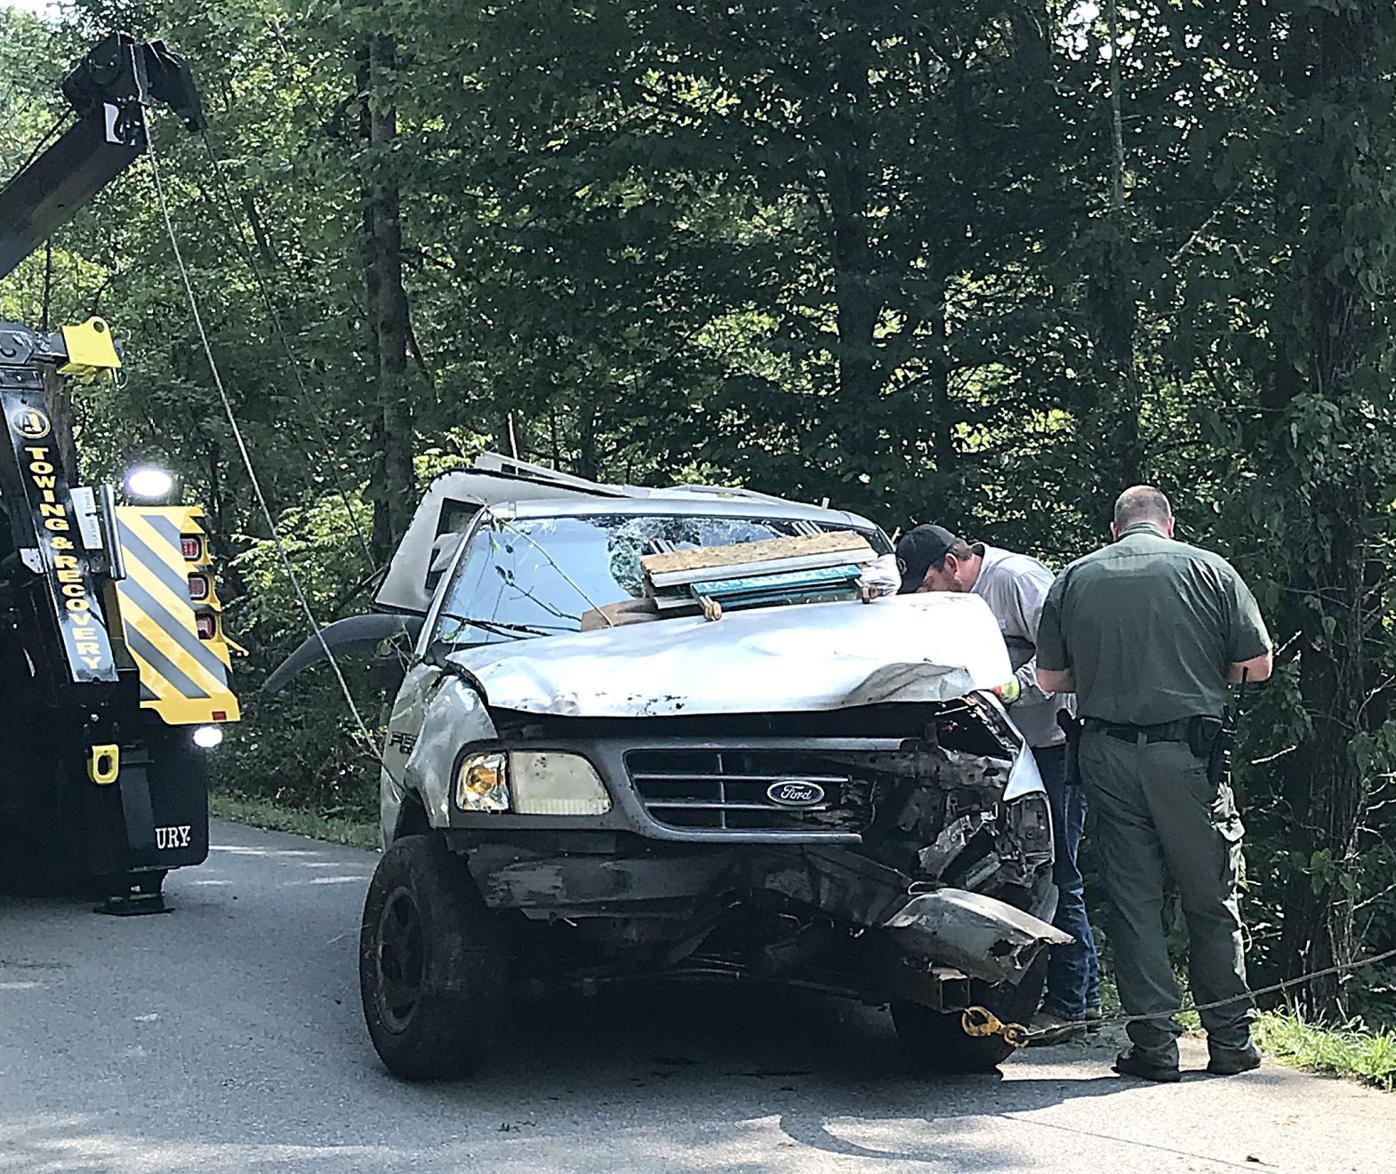 Trooper Conducts Investigation After Fatal Crash